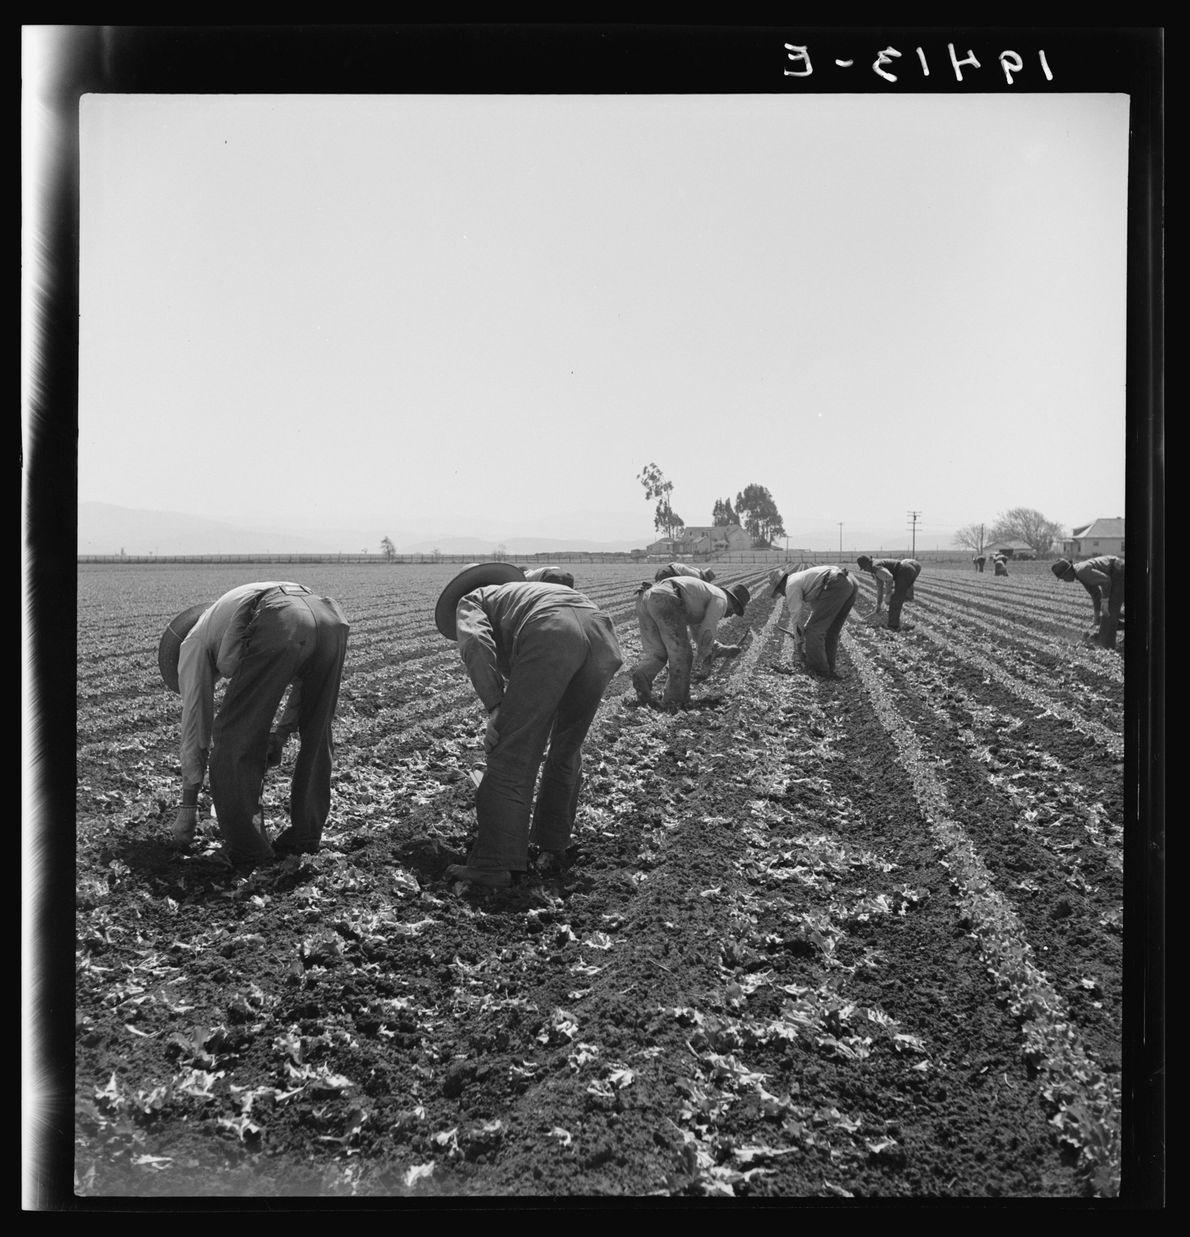 MOTINS DE WATSONVILLE, 1930